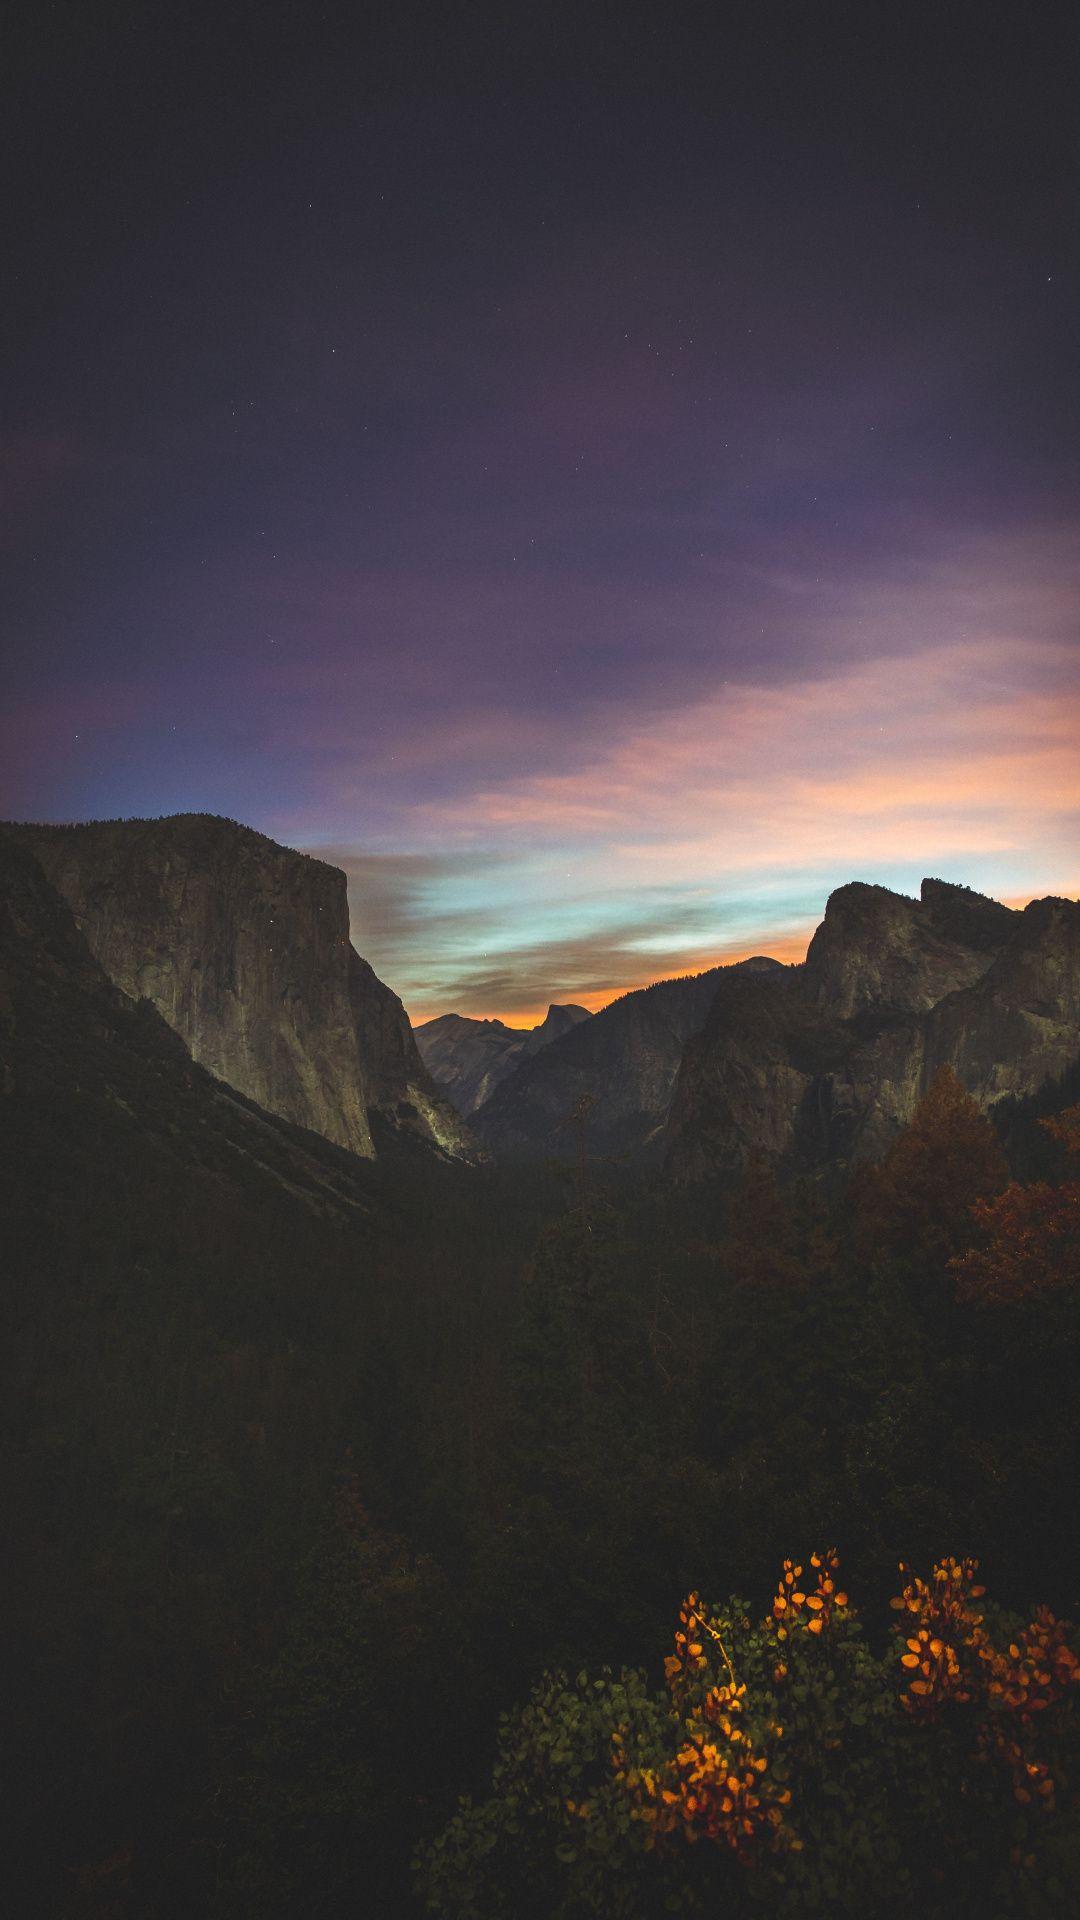 Yosemite Valley Mountains Sky Sunset Nature Night 1080x1920 Wallpaper Night Sky Wallpaper Beautiful Photography Nature Nature Photography